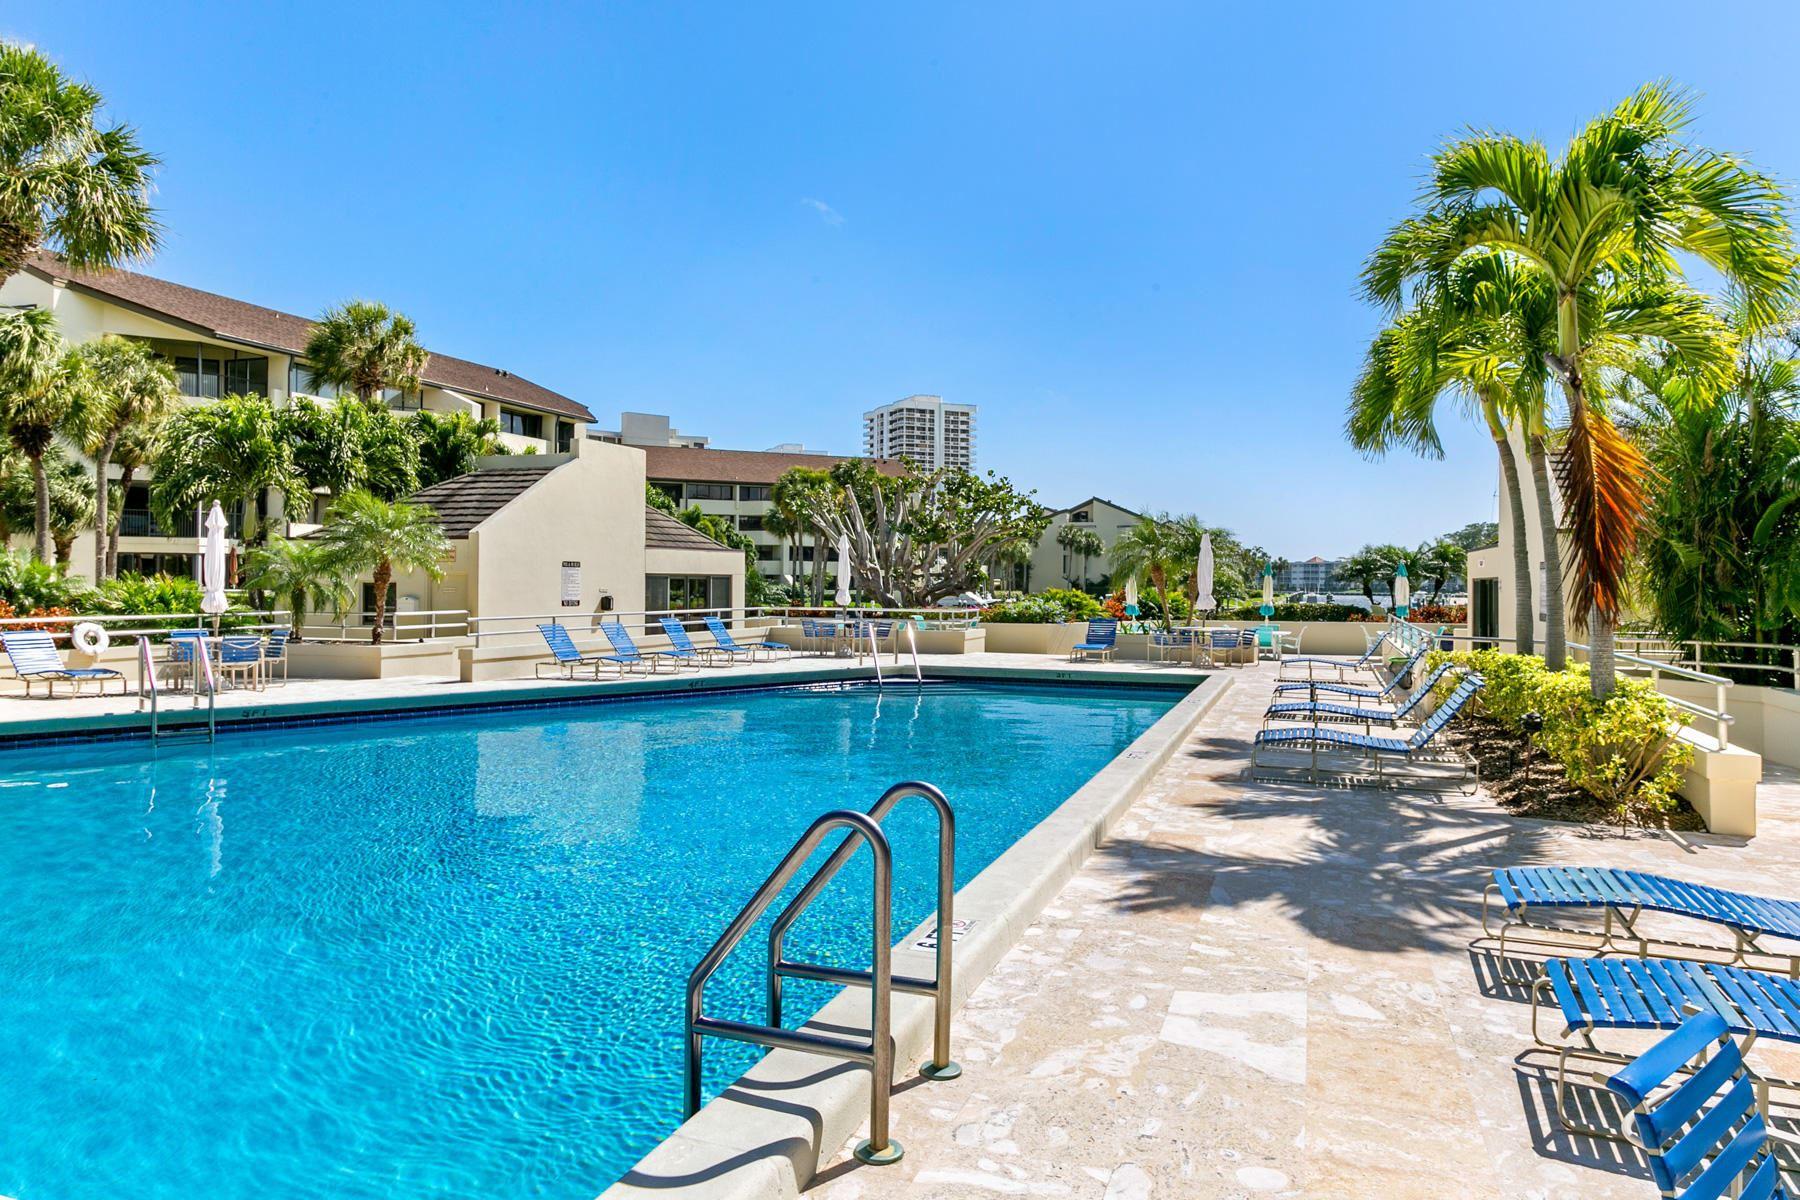 Photo of 1149 Marine Way E #G1l, North Palm Beach, FL 33408 (MLS # RX-10694068)